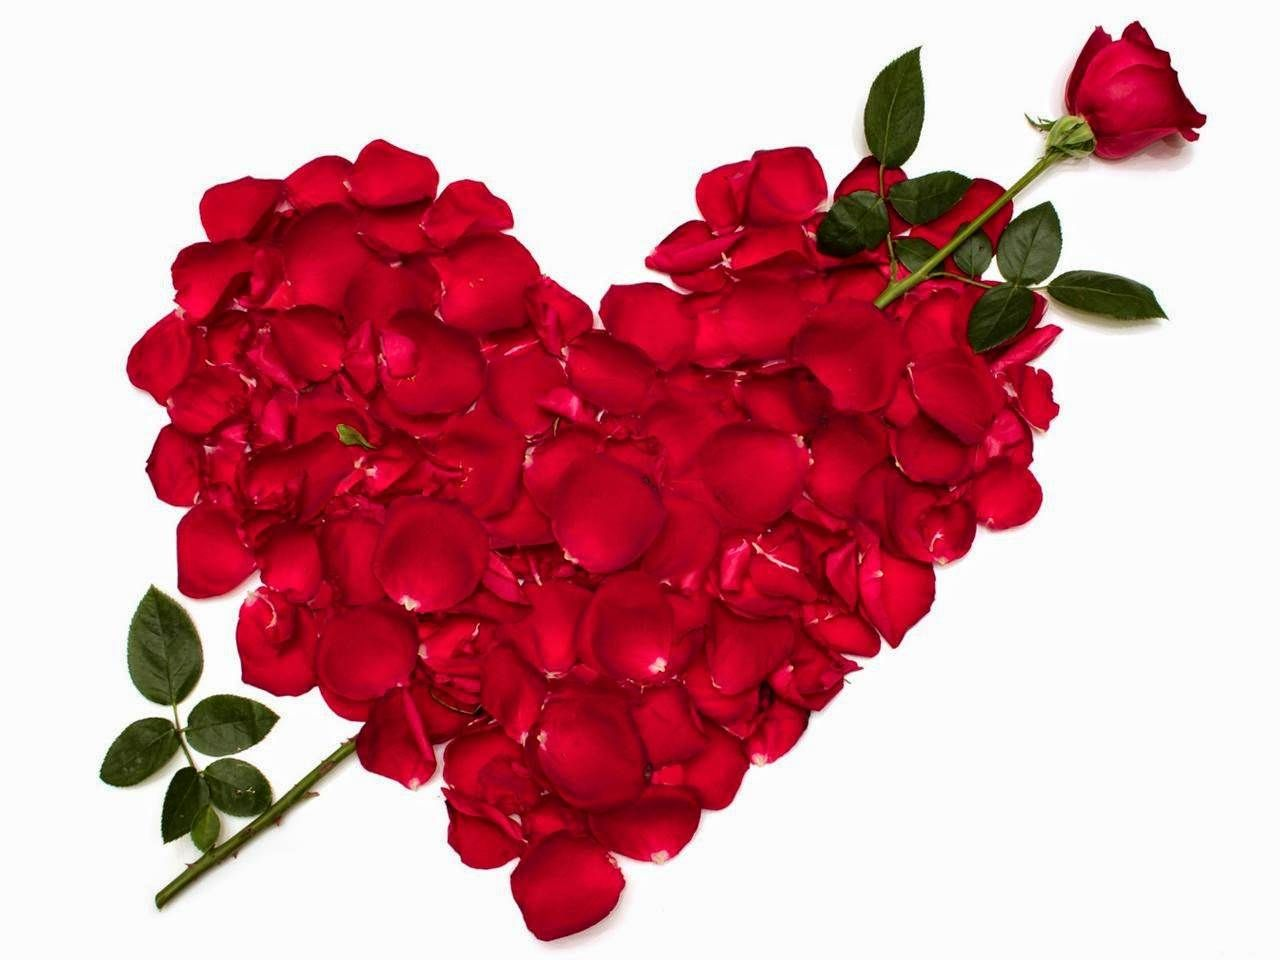 Outstanding Love Rose Wallpaper Te Org 1280 960 Rose Flower Image Adorable Wallpapers Rose Flower Wallpaper Red Rose Petals Love Rose Flower